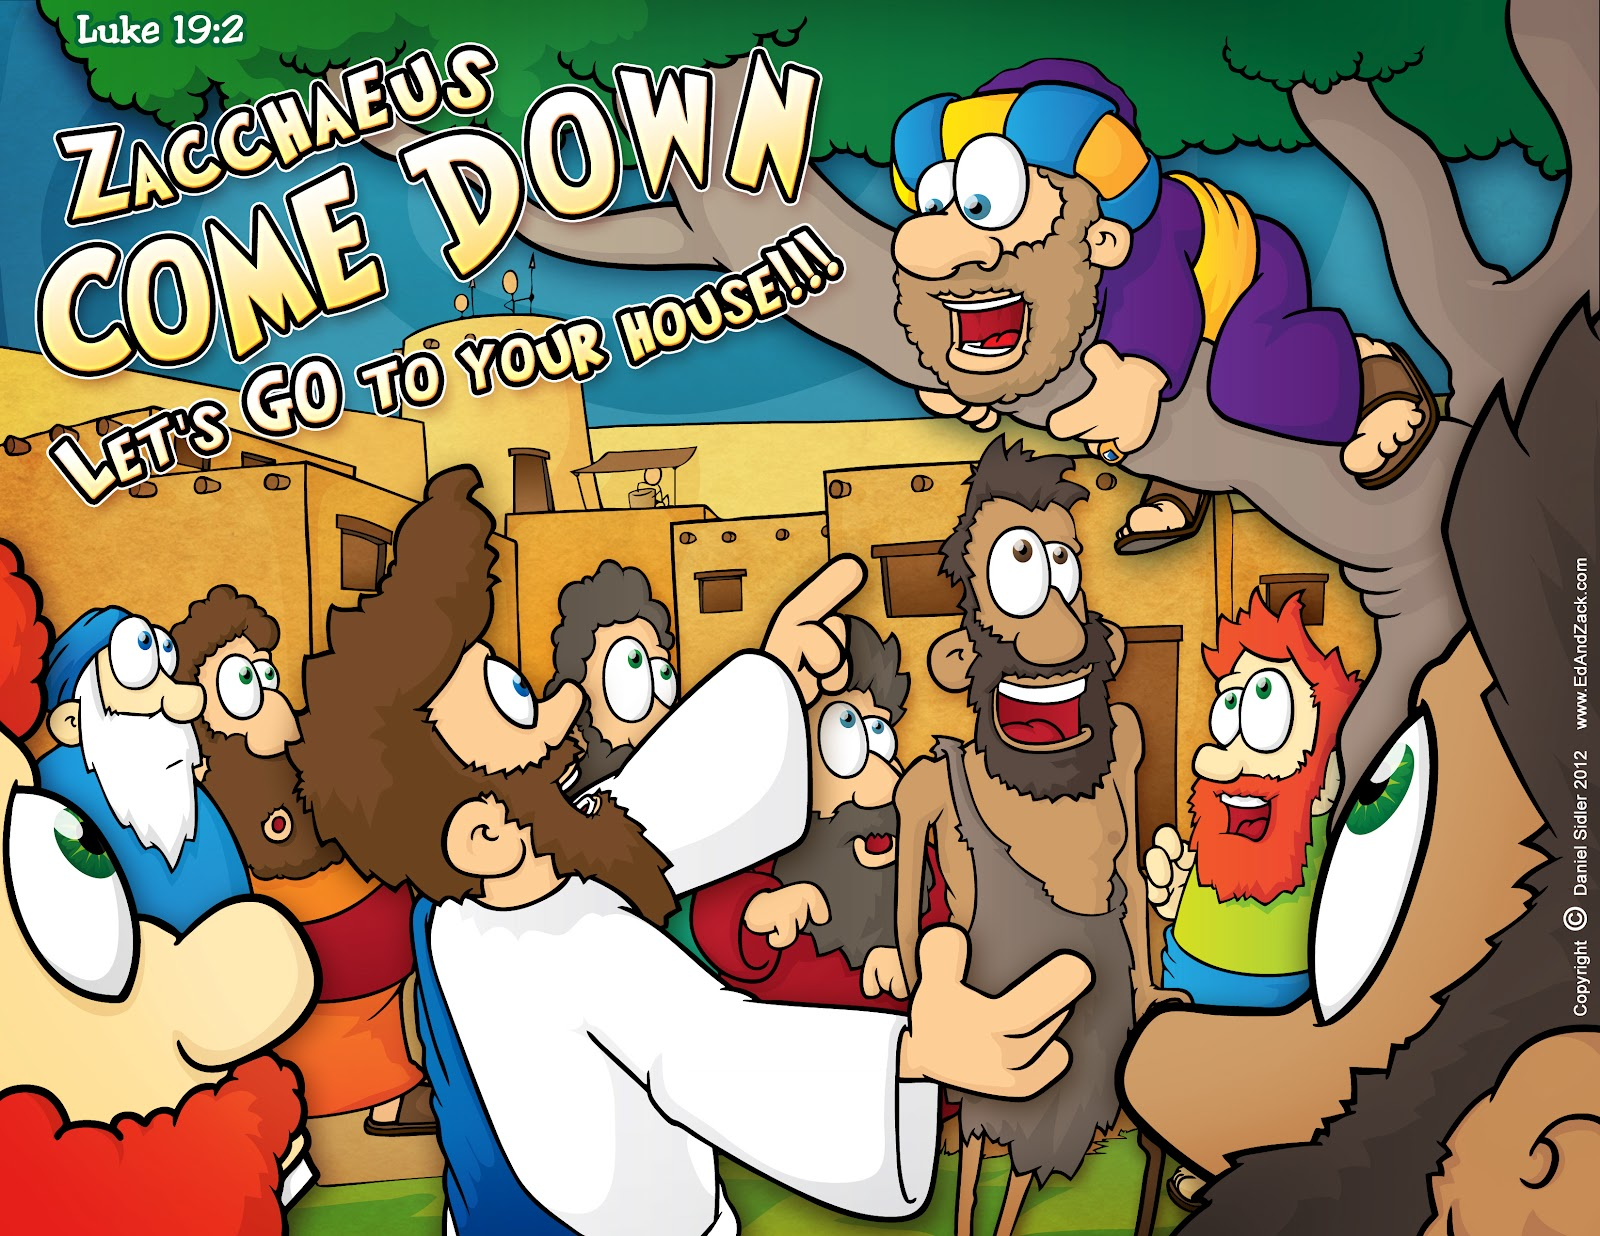 christian cartoon bible story illustrations